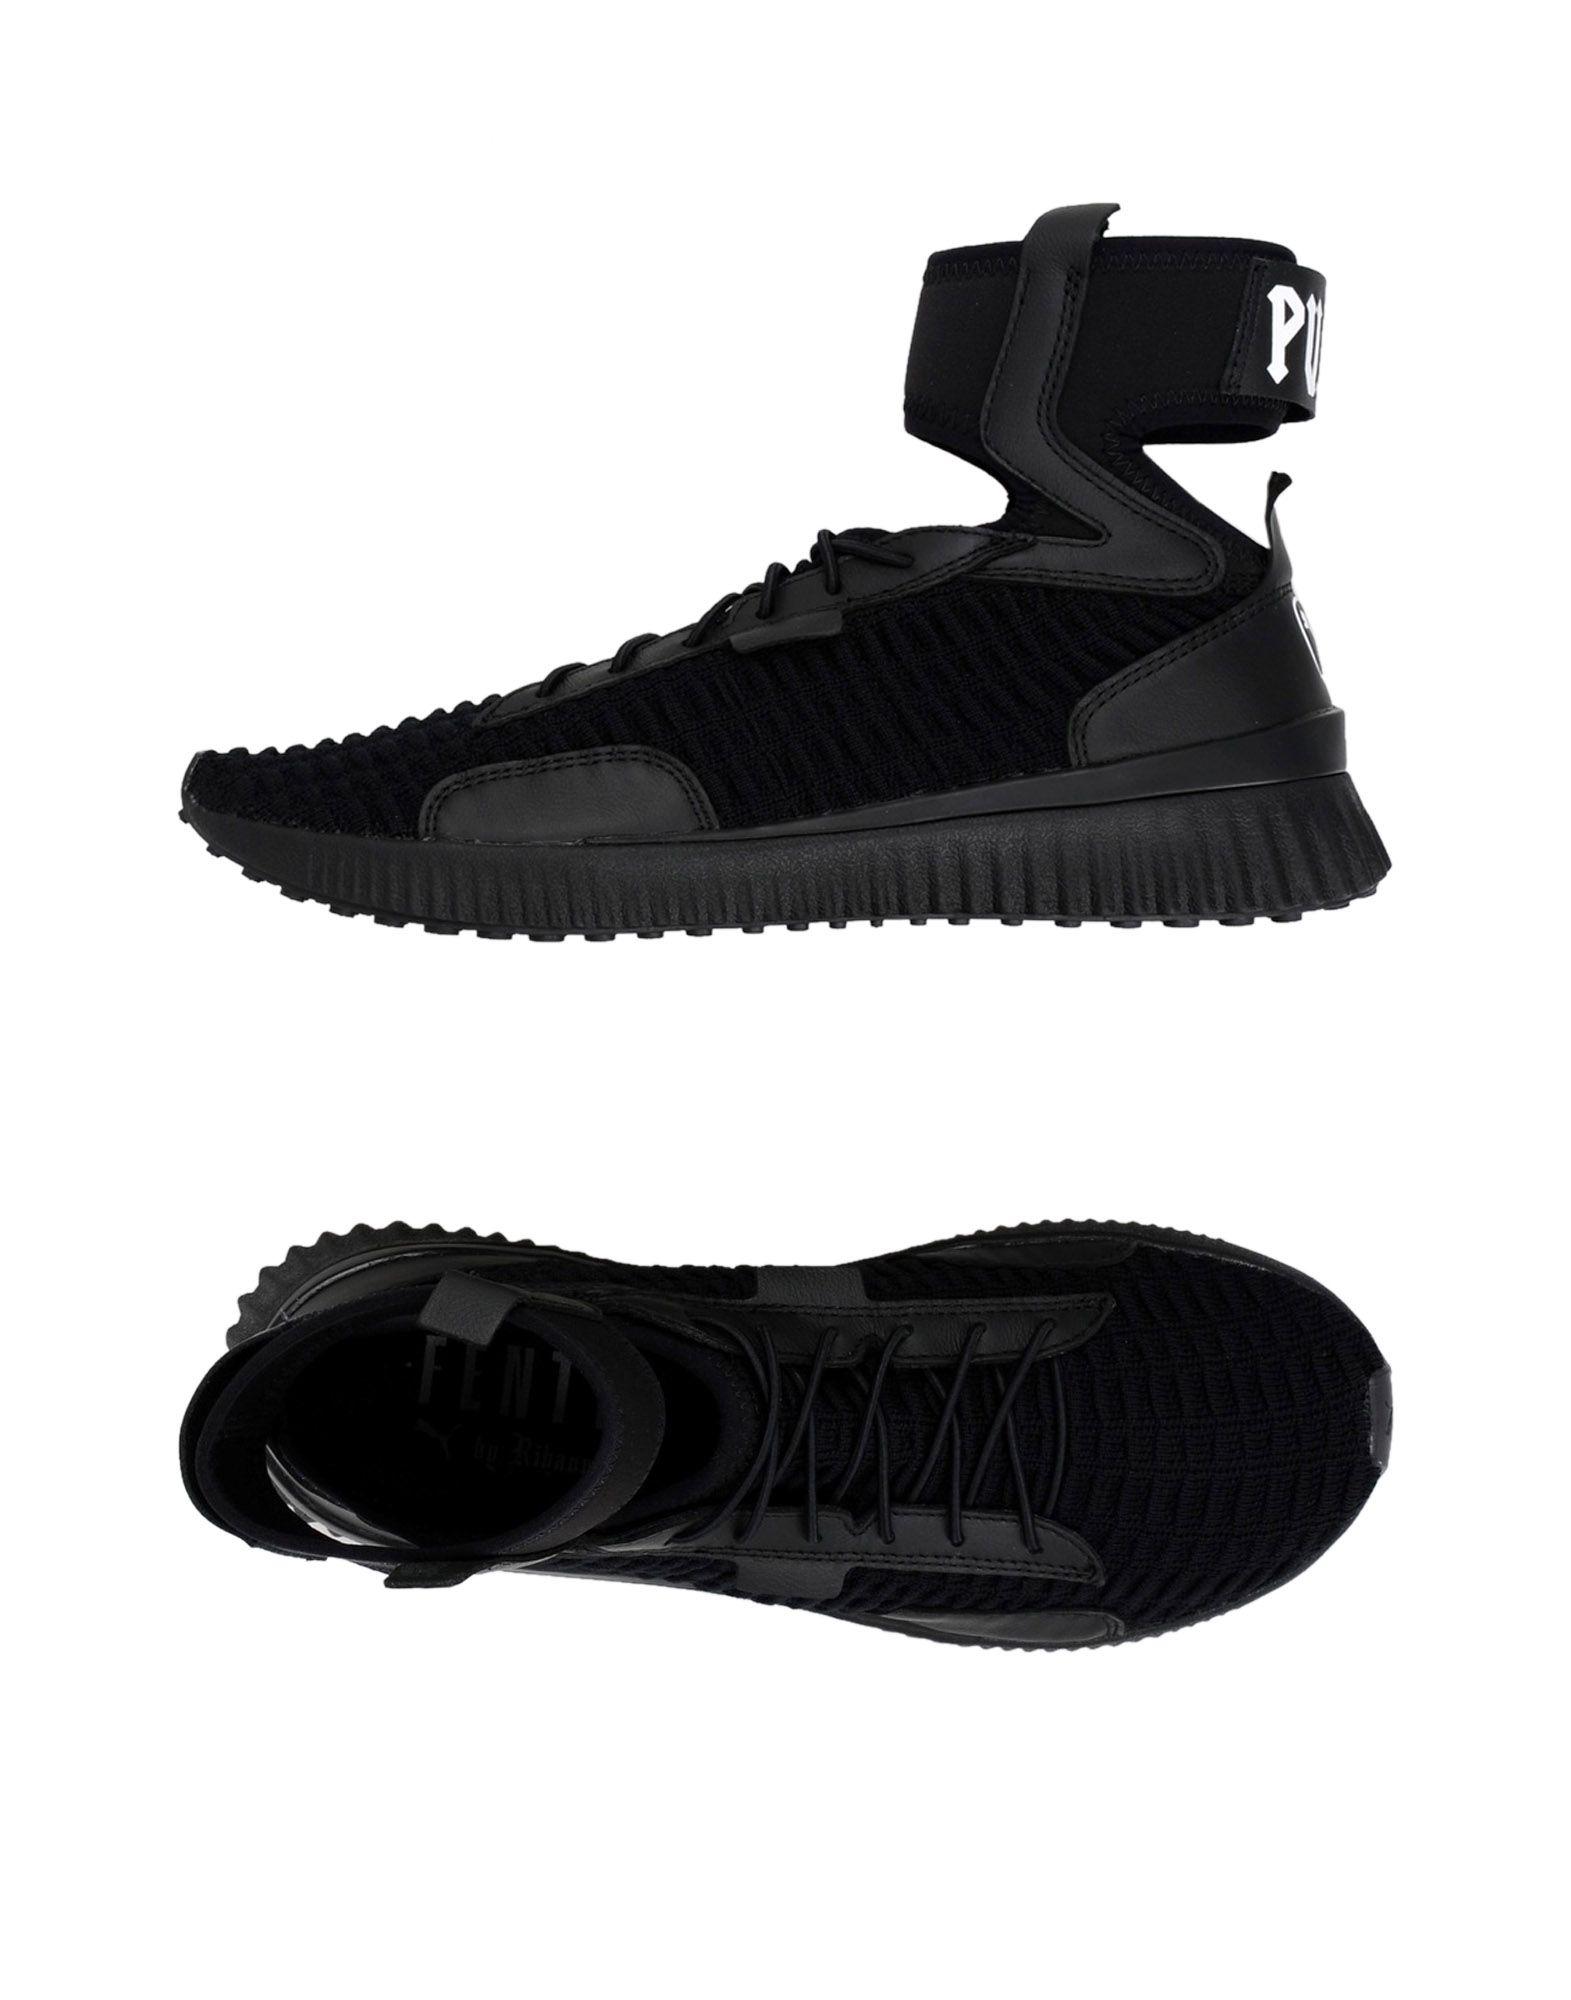 Sneakers Fenty Puma By Rihanna Fenty Trainer Mid - Donna - Acquista online su